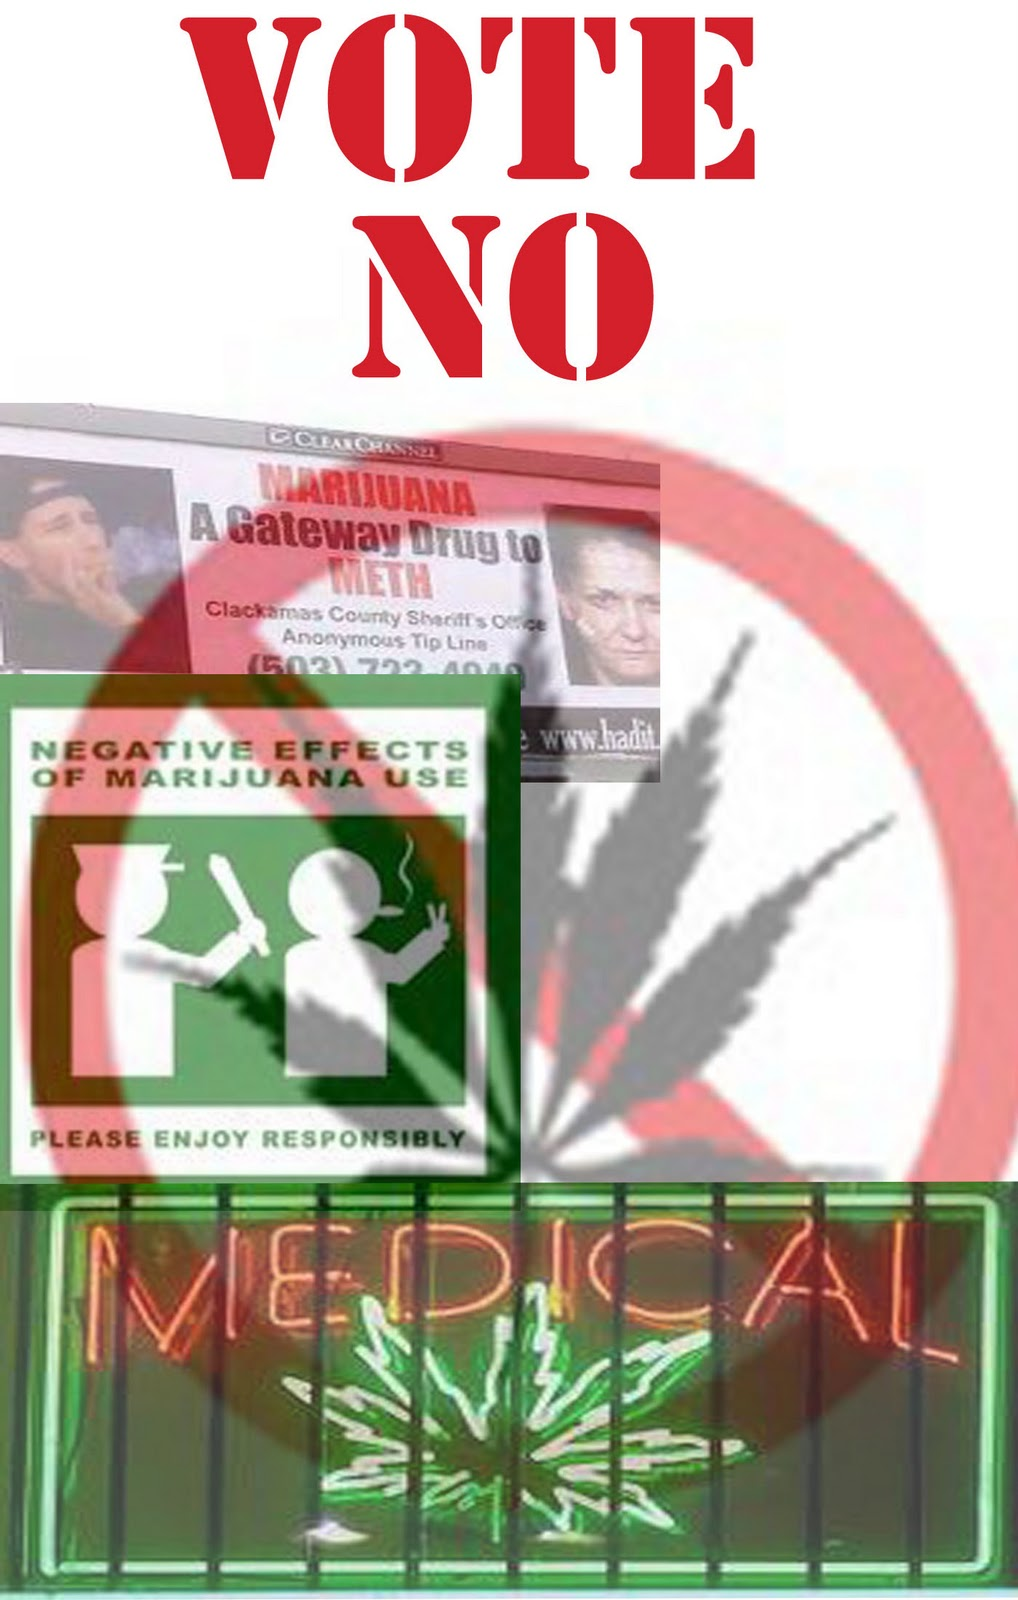 Legalizing Marijuana Thesis Statement